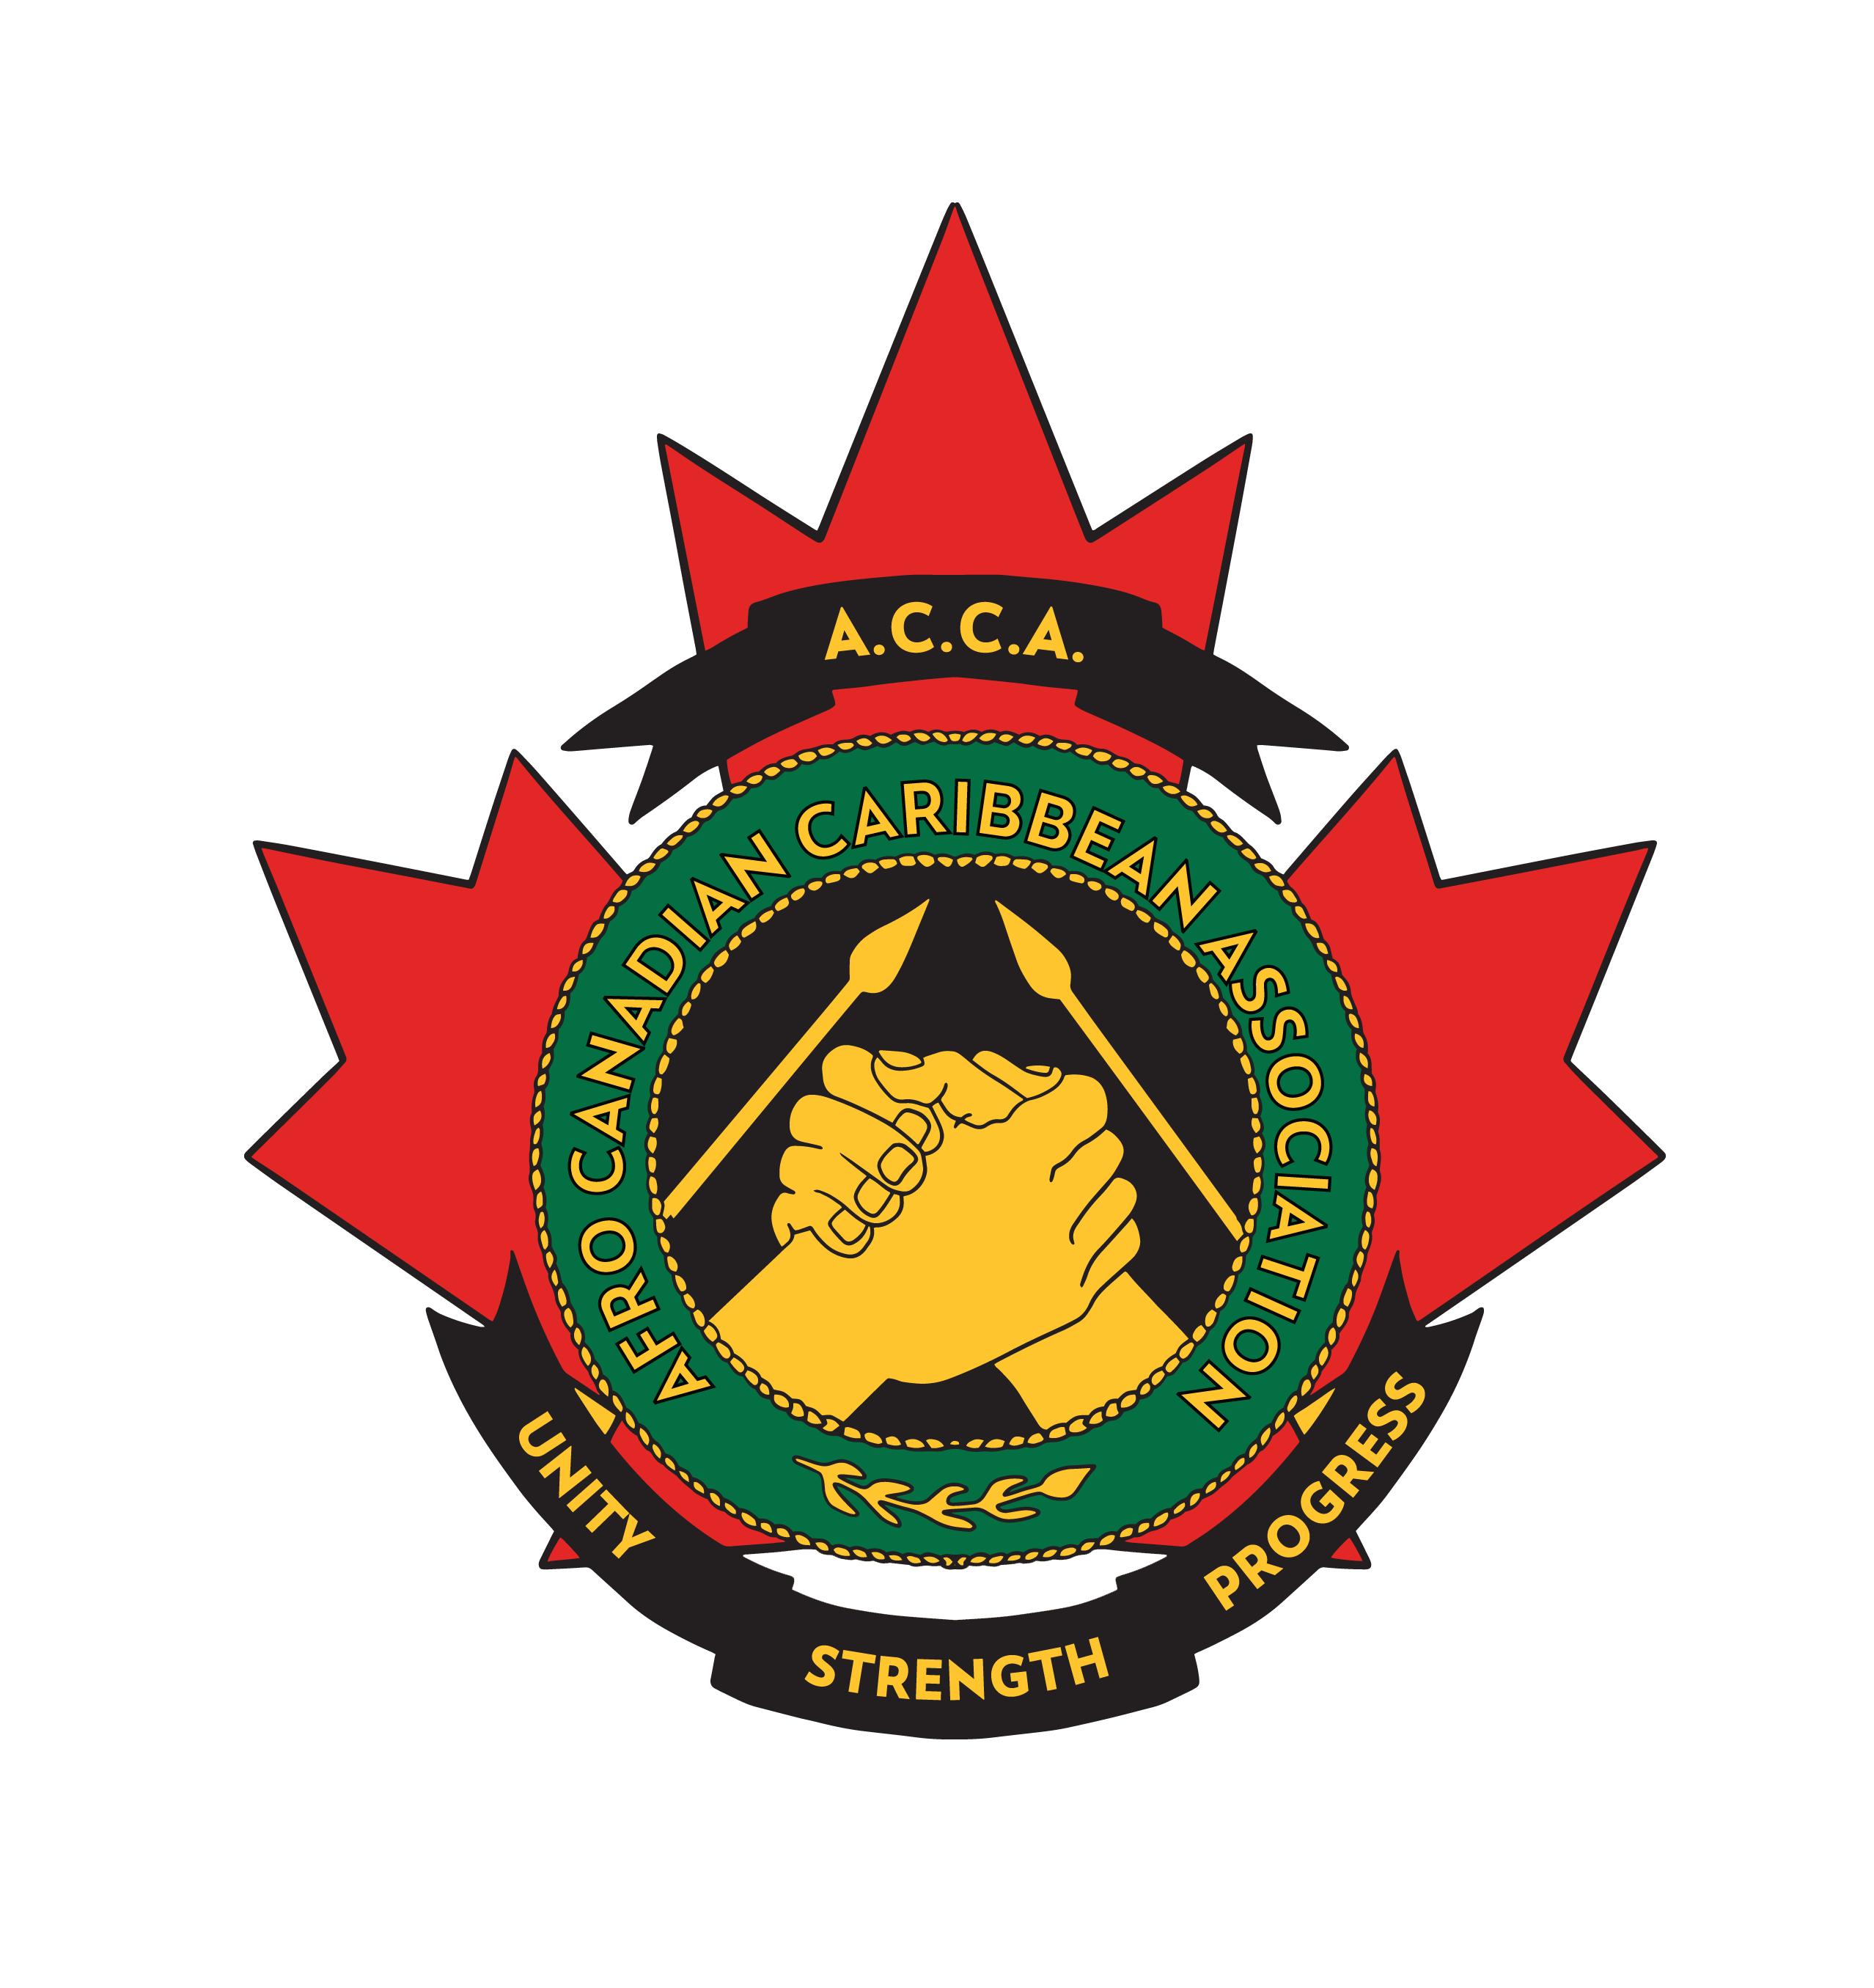 Afro Canadian Caribbean Association